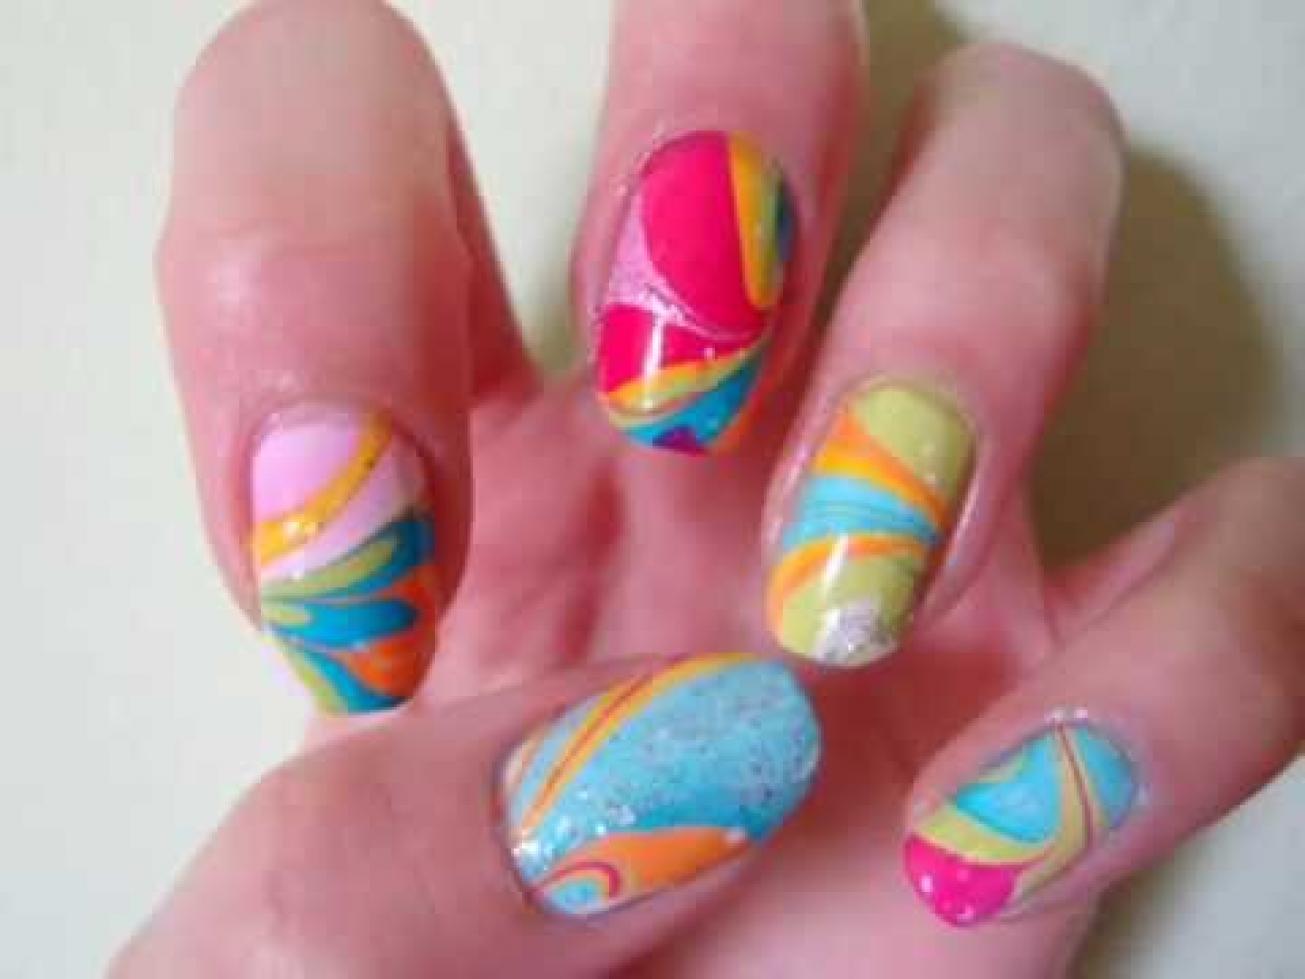 Marble Nail Art: unghie come opere d'arte in pochi minuti! - Beauty ...